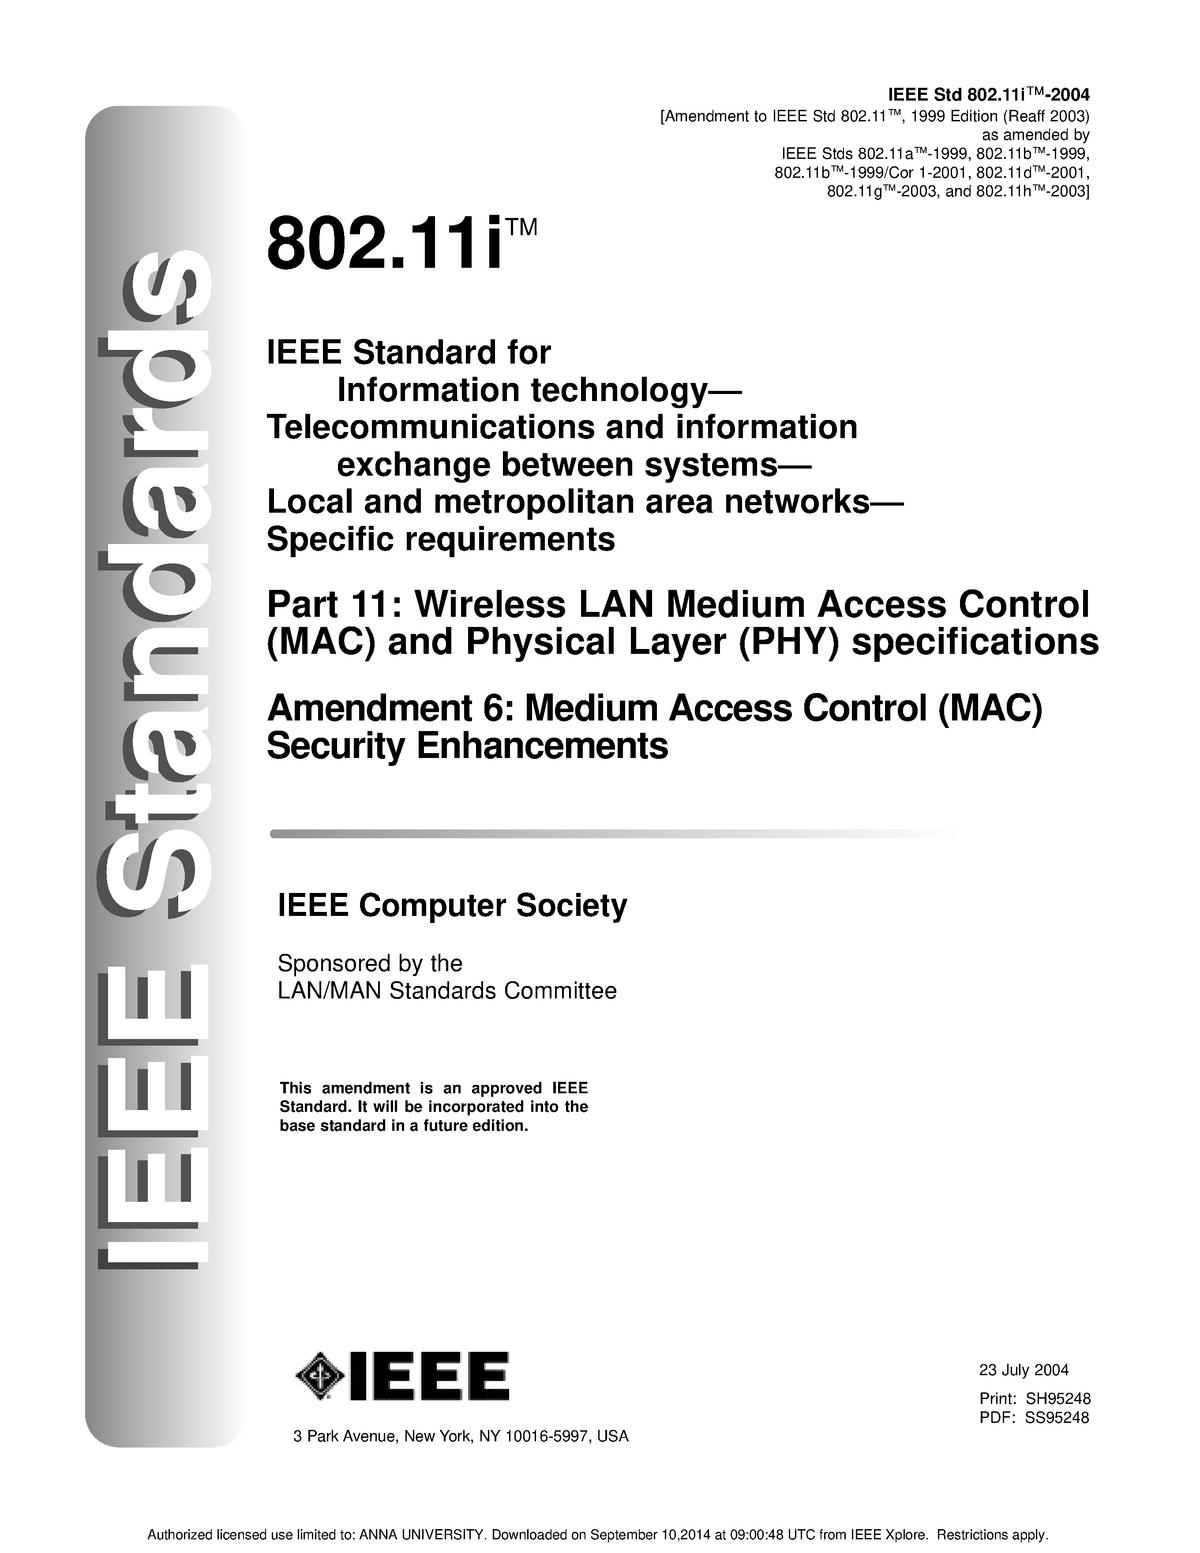 Part 11: Wireless LAN Medium Access Control (MAC) and